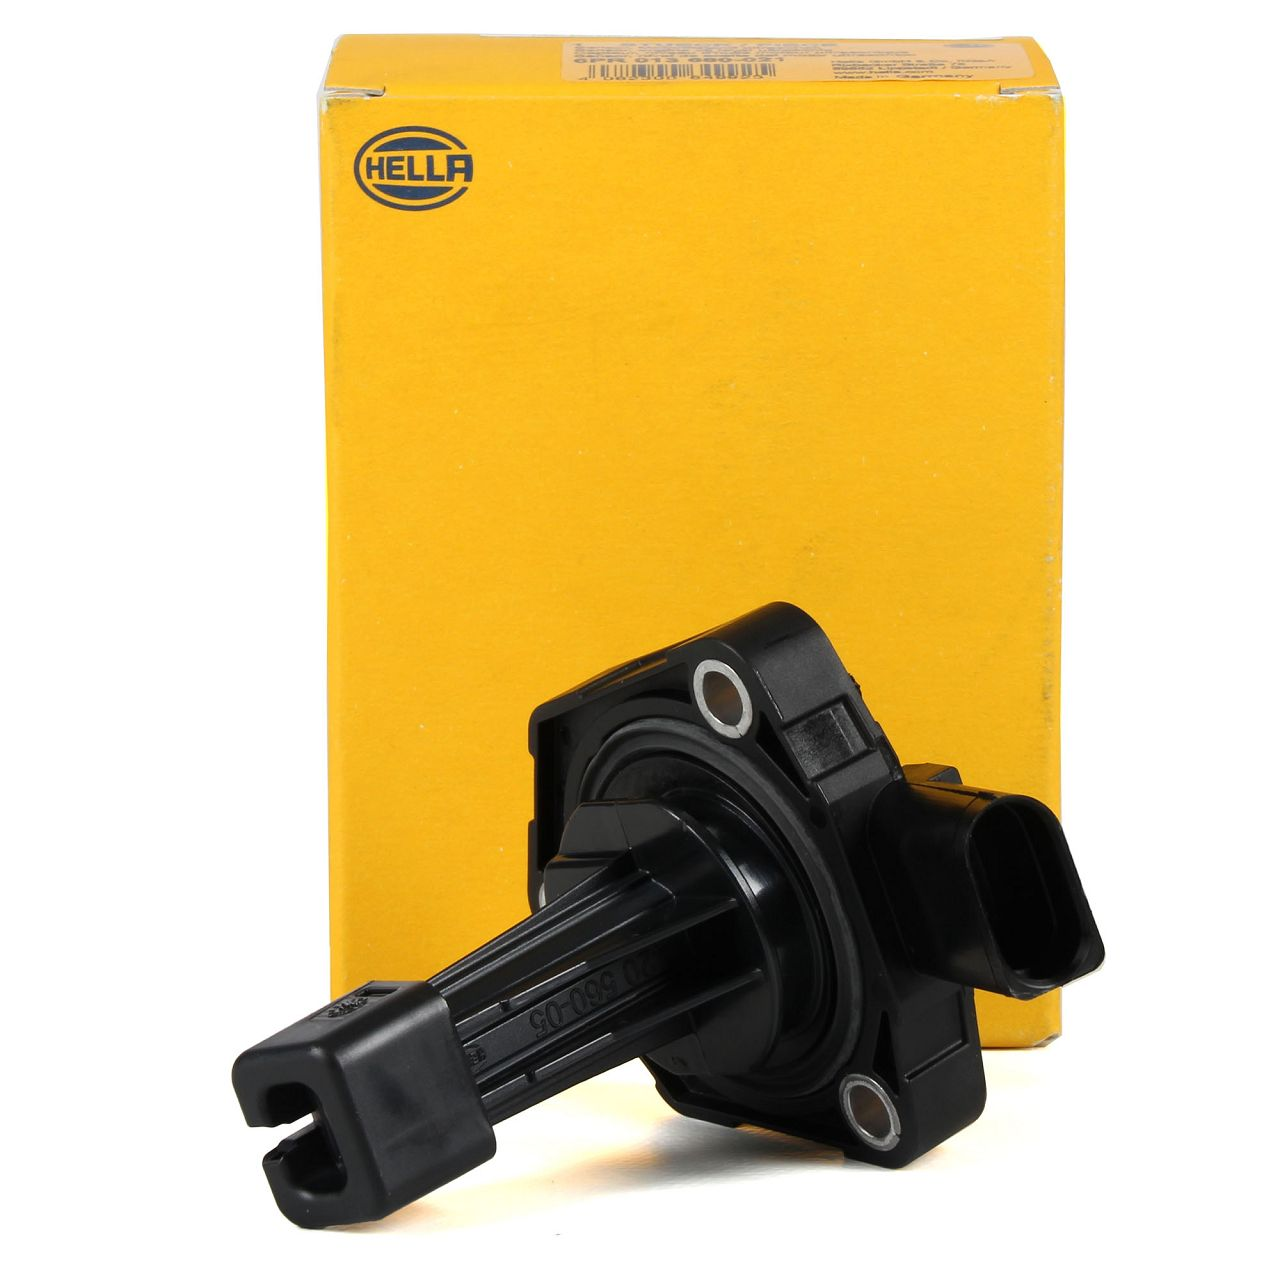 HELLA Ölniveausensor Ölstandsensor AUDI SEAT SKODA VW 1.6/2.0 TDI 04L907660C